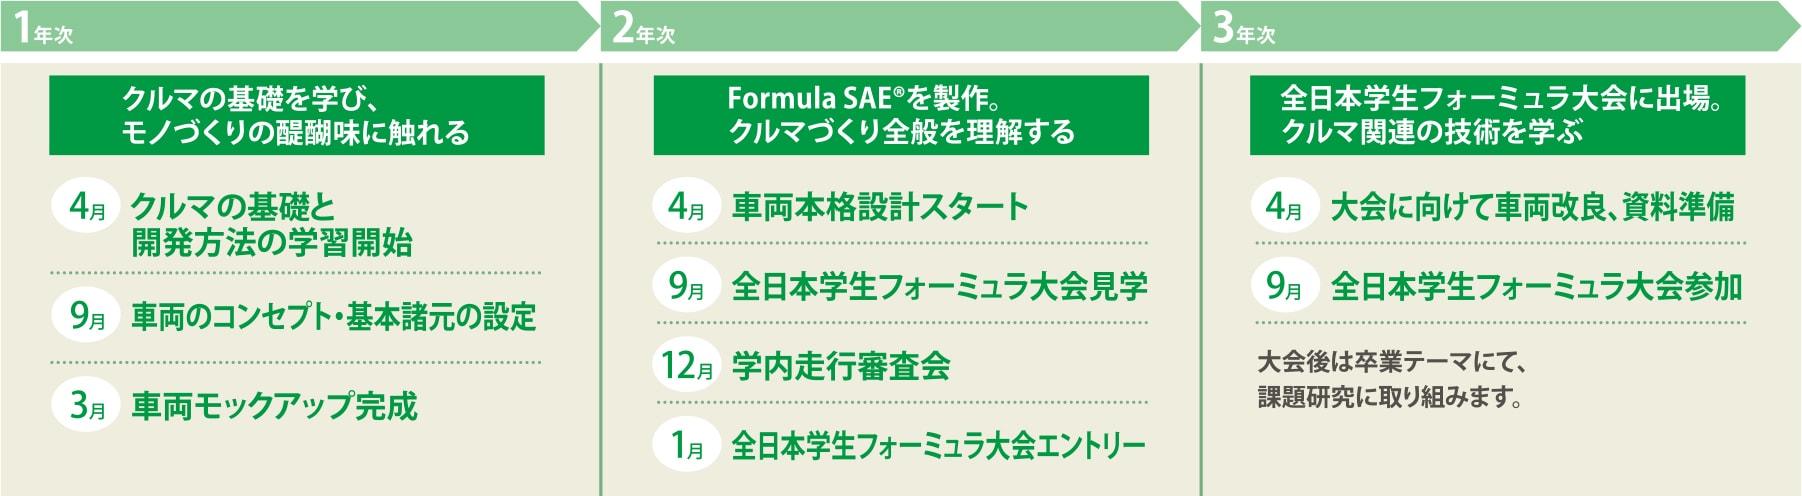 Formula SAE®の大会参加に向けて3年間の自動車研究開発スケジュール